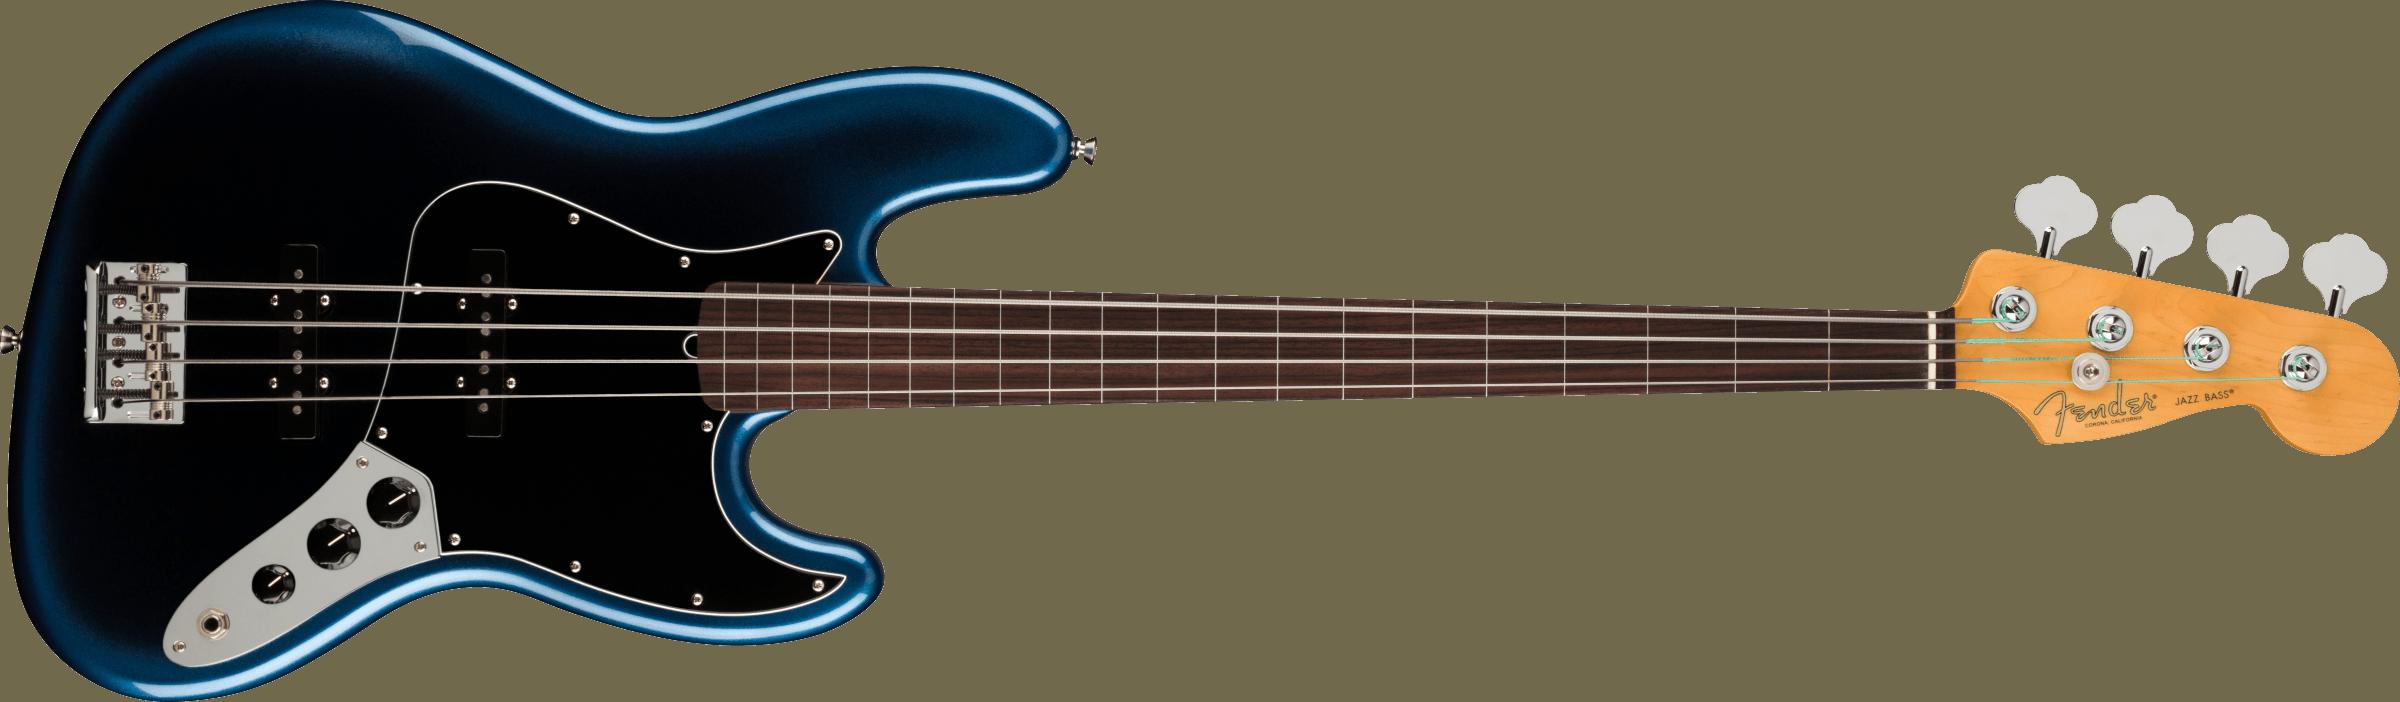 FENDER-American-Professional-II-Jazz-Bass-Fretless-Rosewood-Fingerboard-Dark-Night-sku-571005254